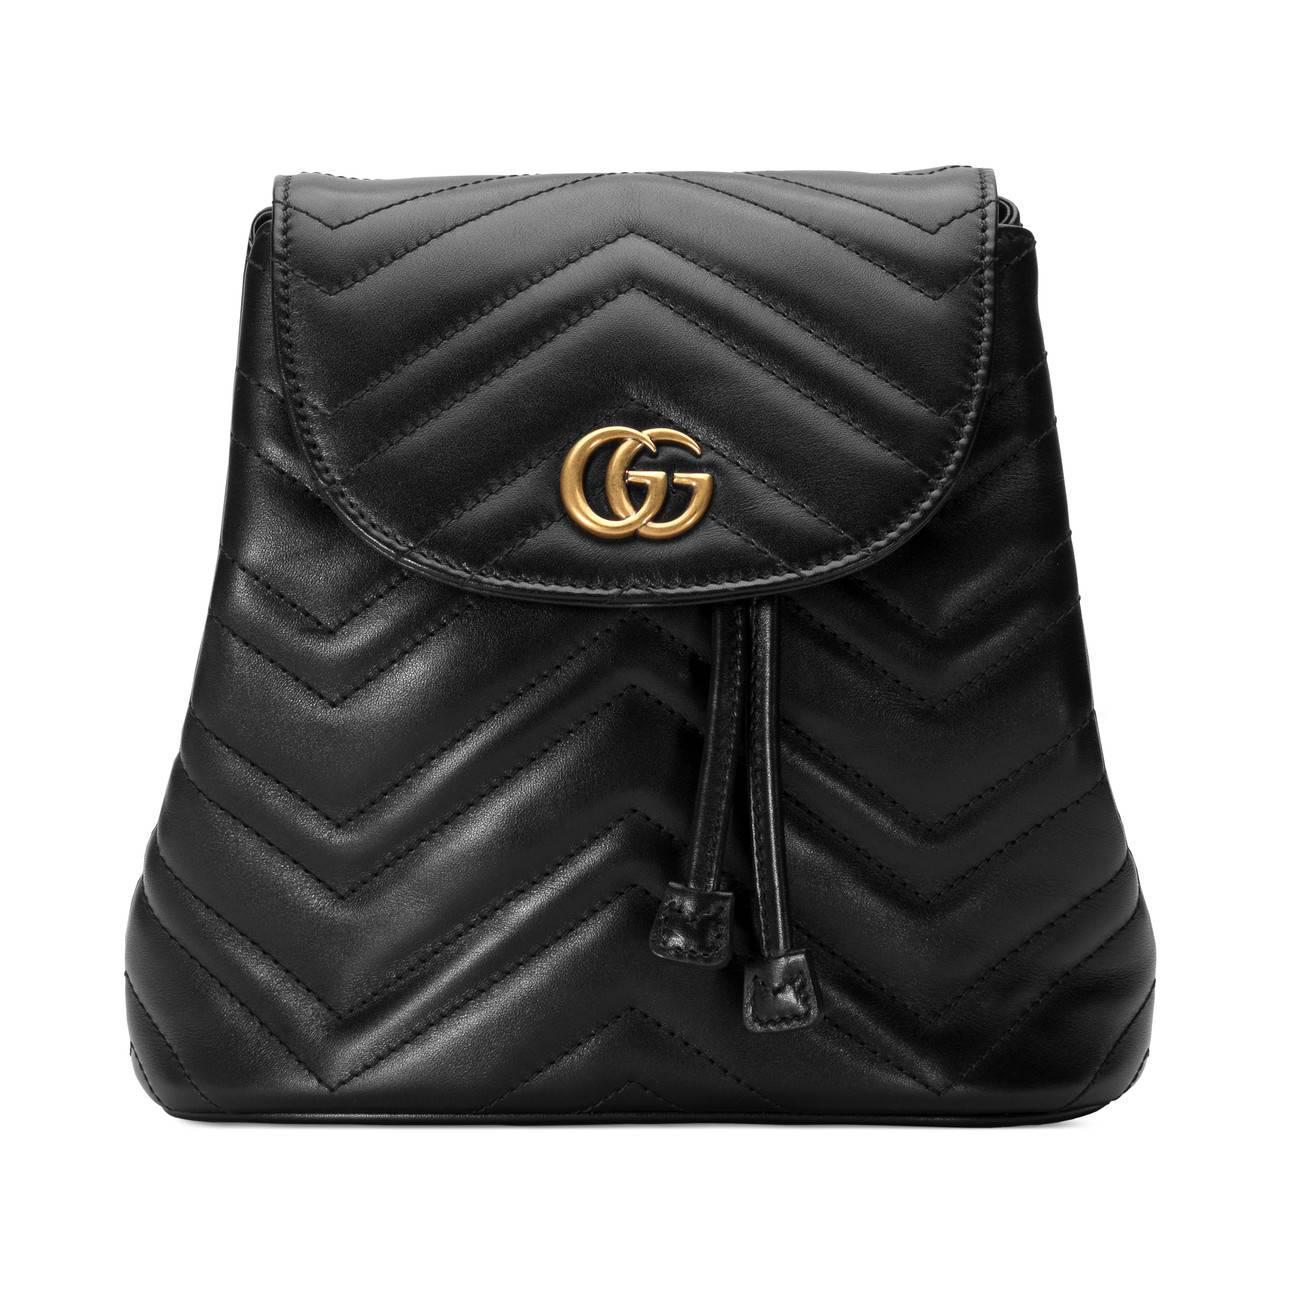 Gucci. Women s Black Gg Marmont 2.0 Matelasse Leather Mini Backpack - d28b5c50629aa